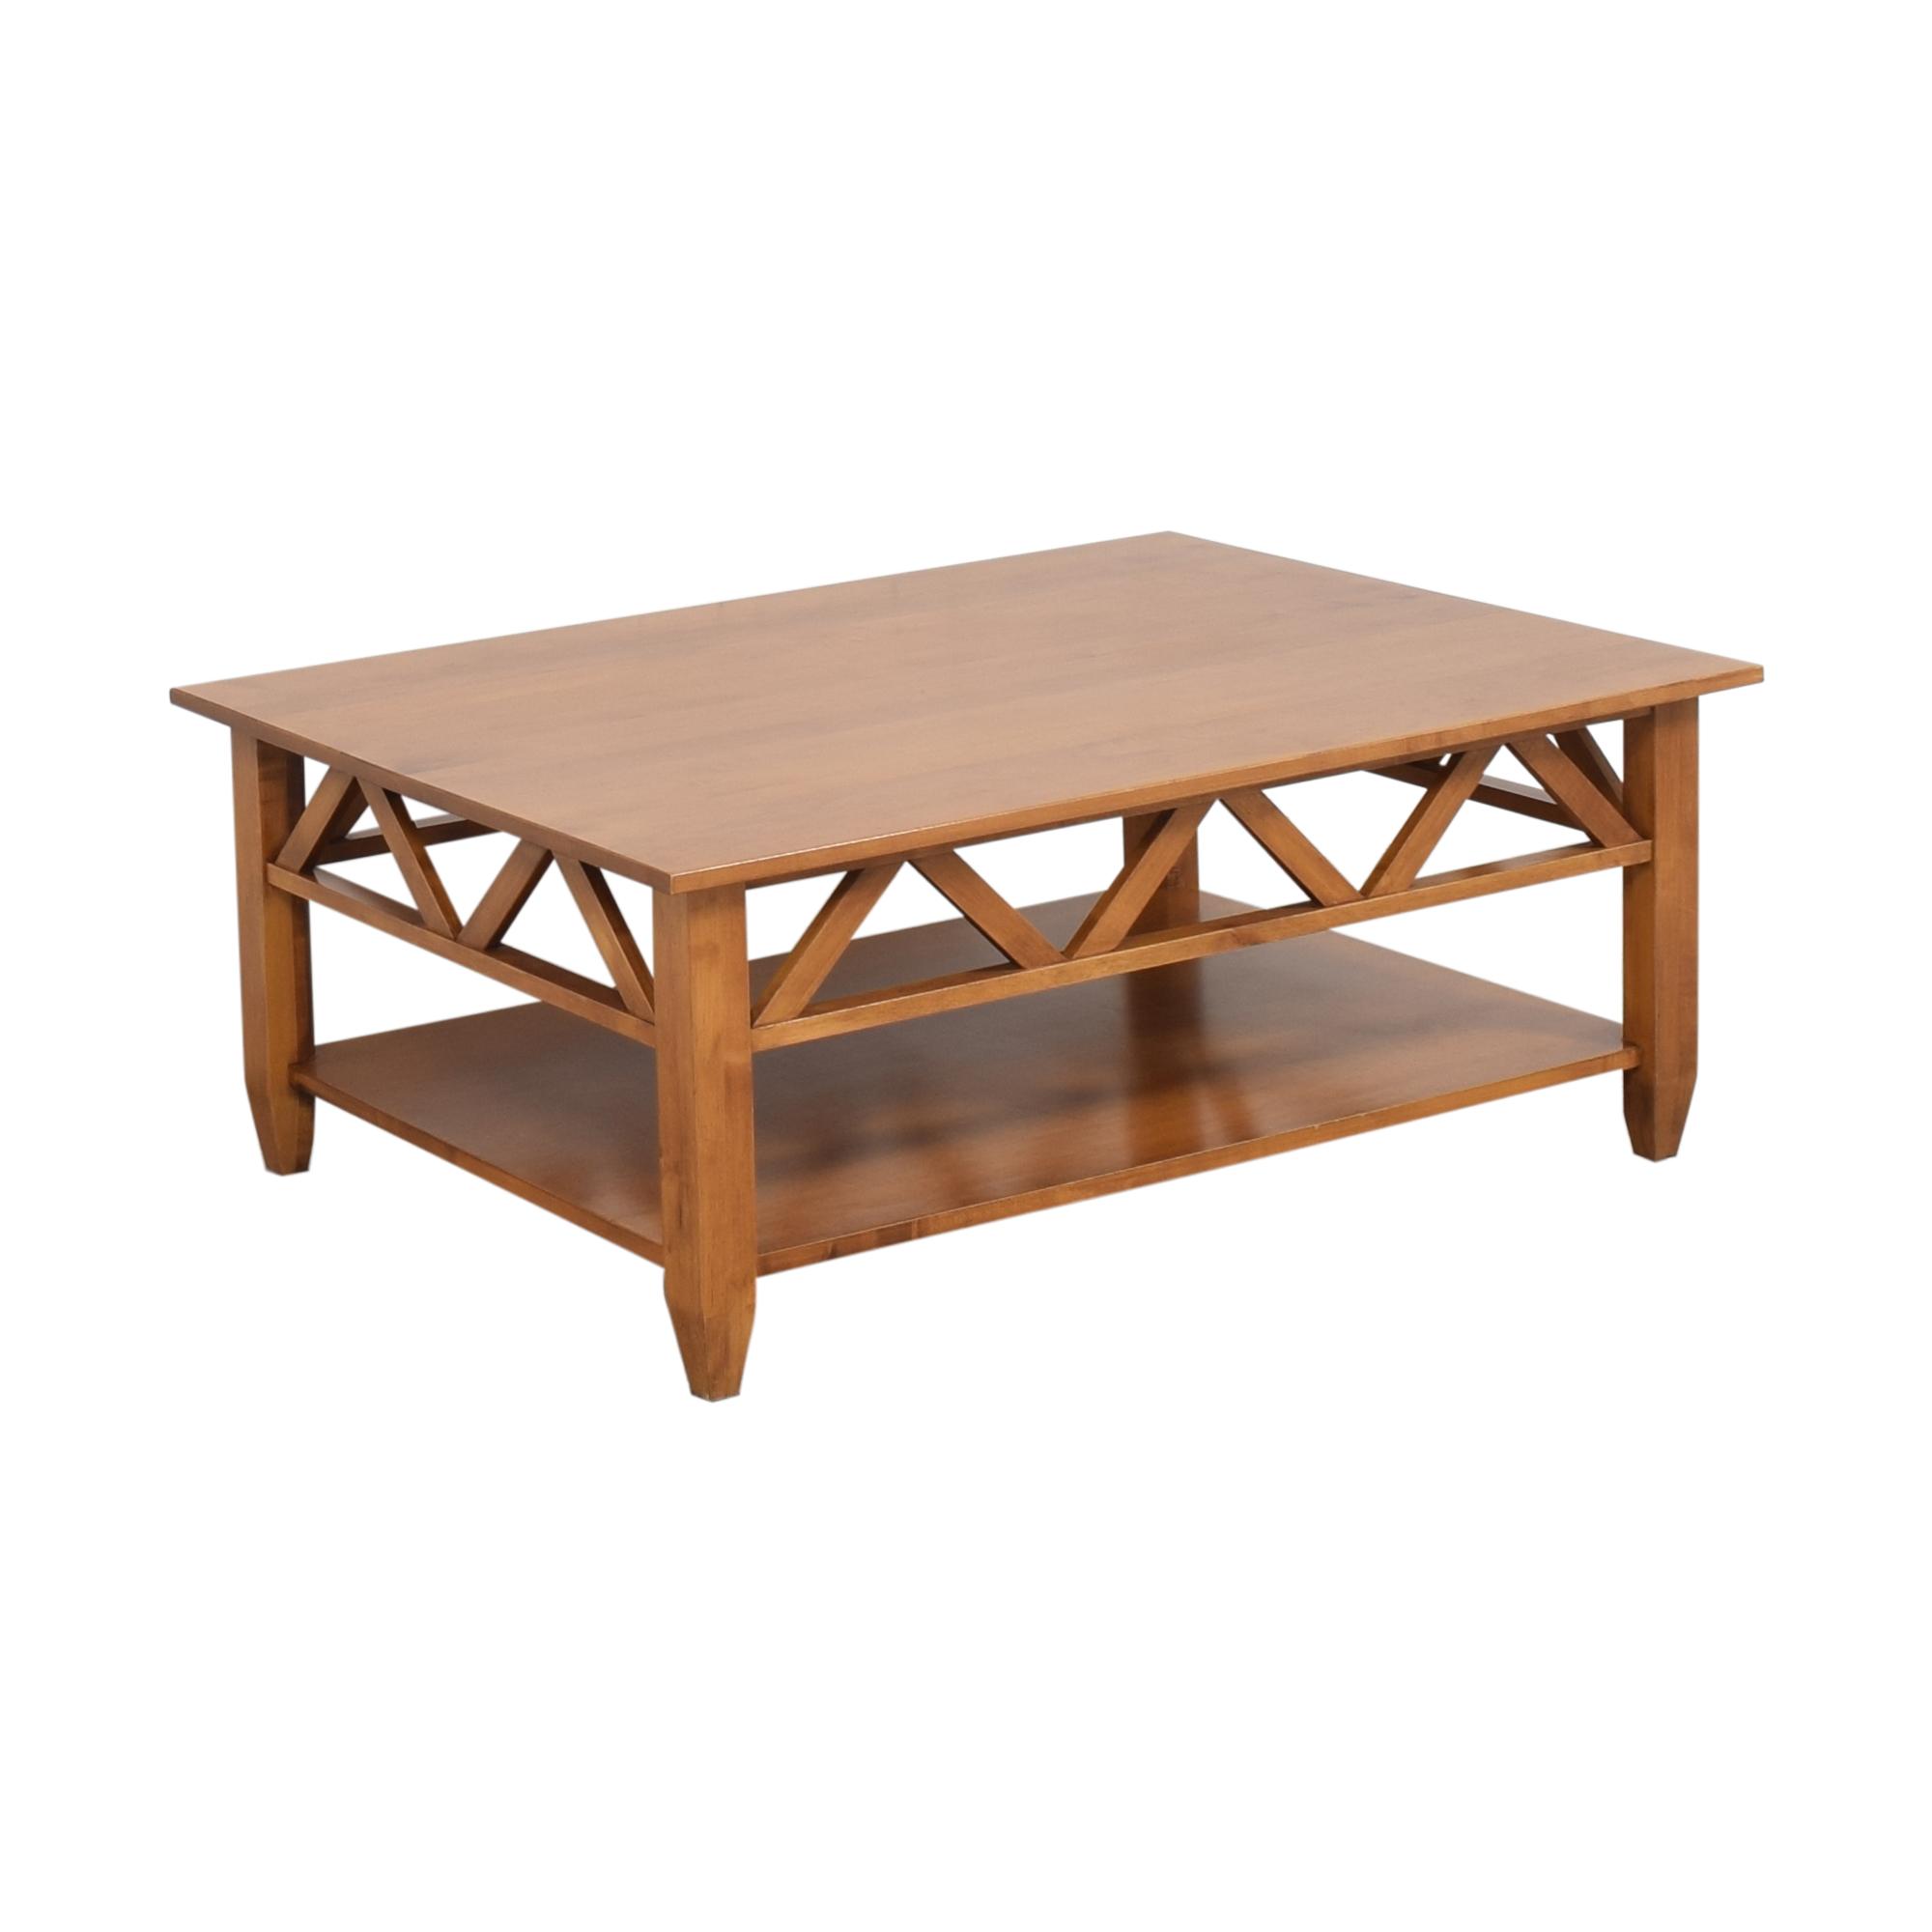 Ethan Allen Ethan Allen Rectangular Coffee Table second hand